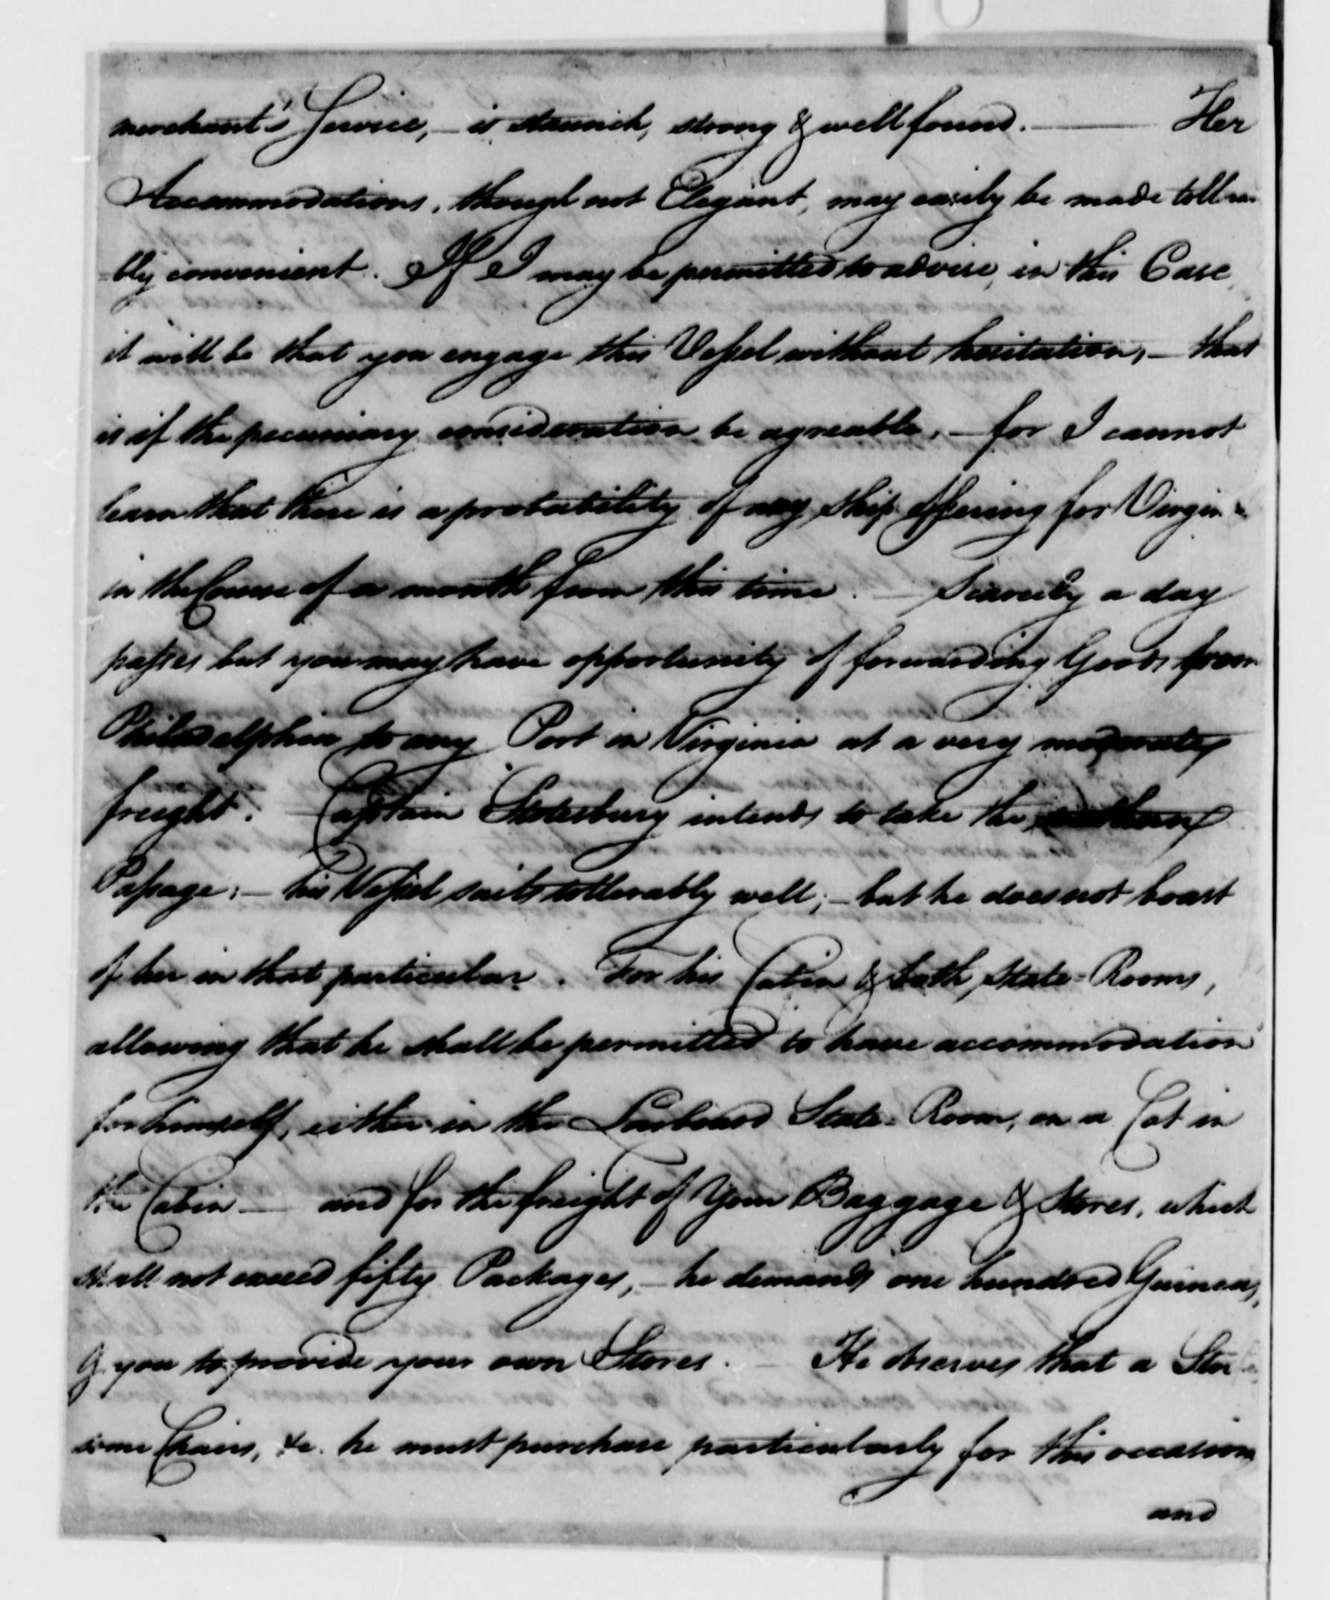 Nathaniel Cutting to Thomas Jefferson, September 12, 1789